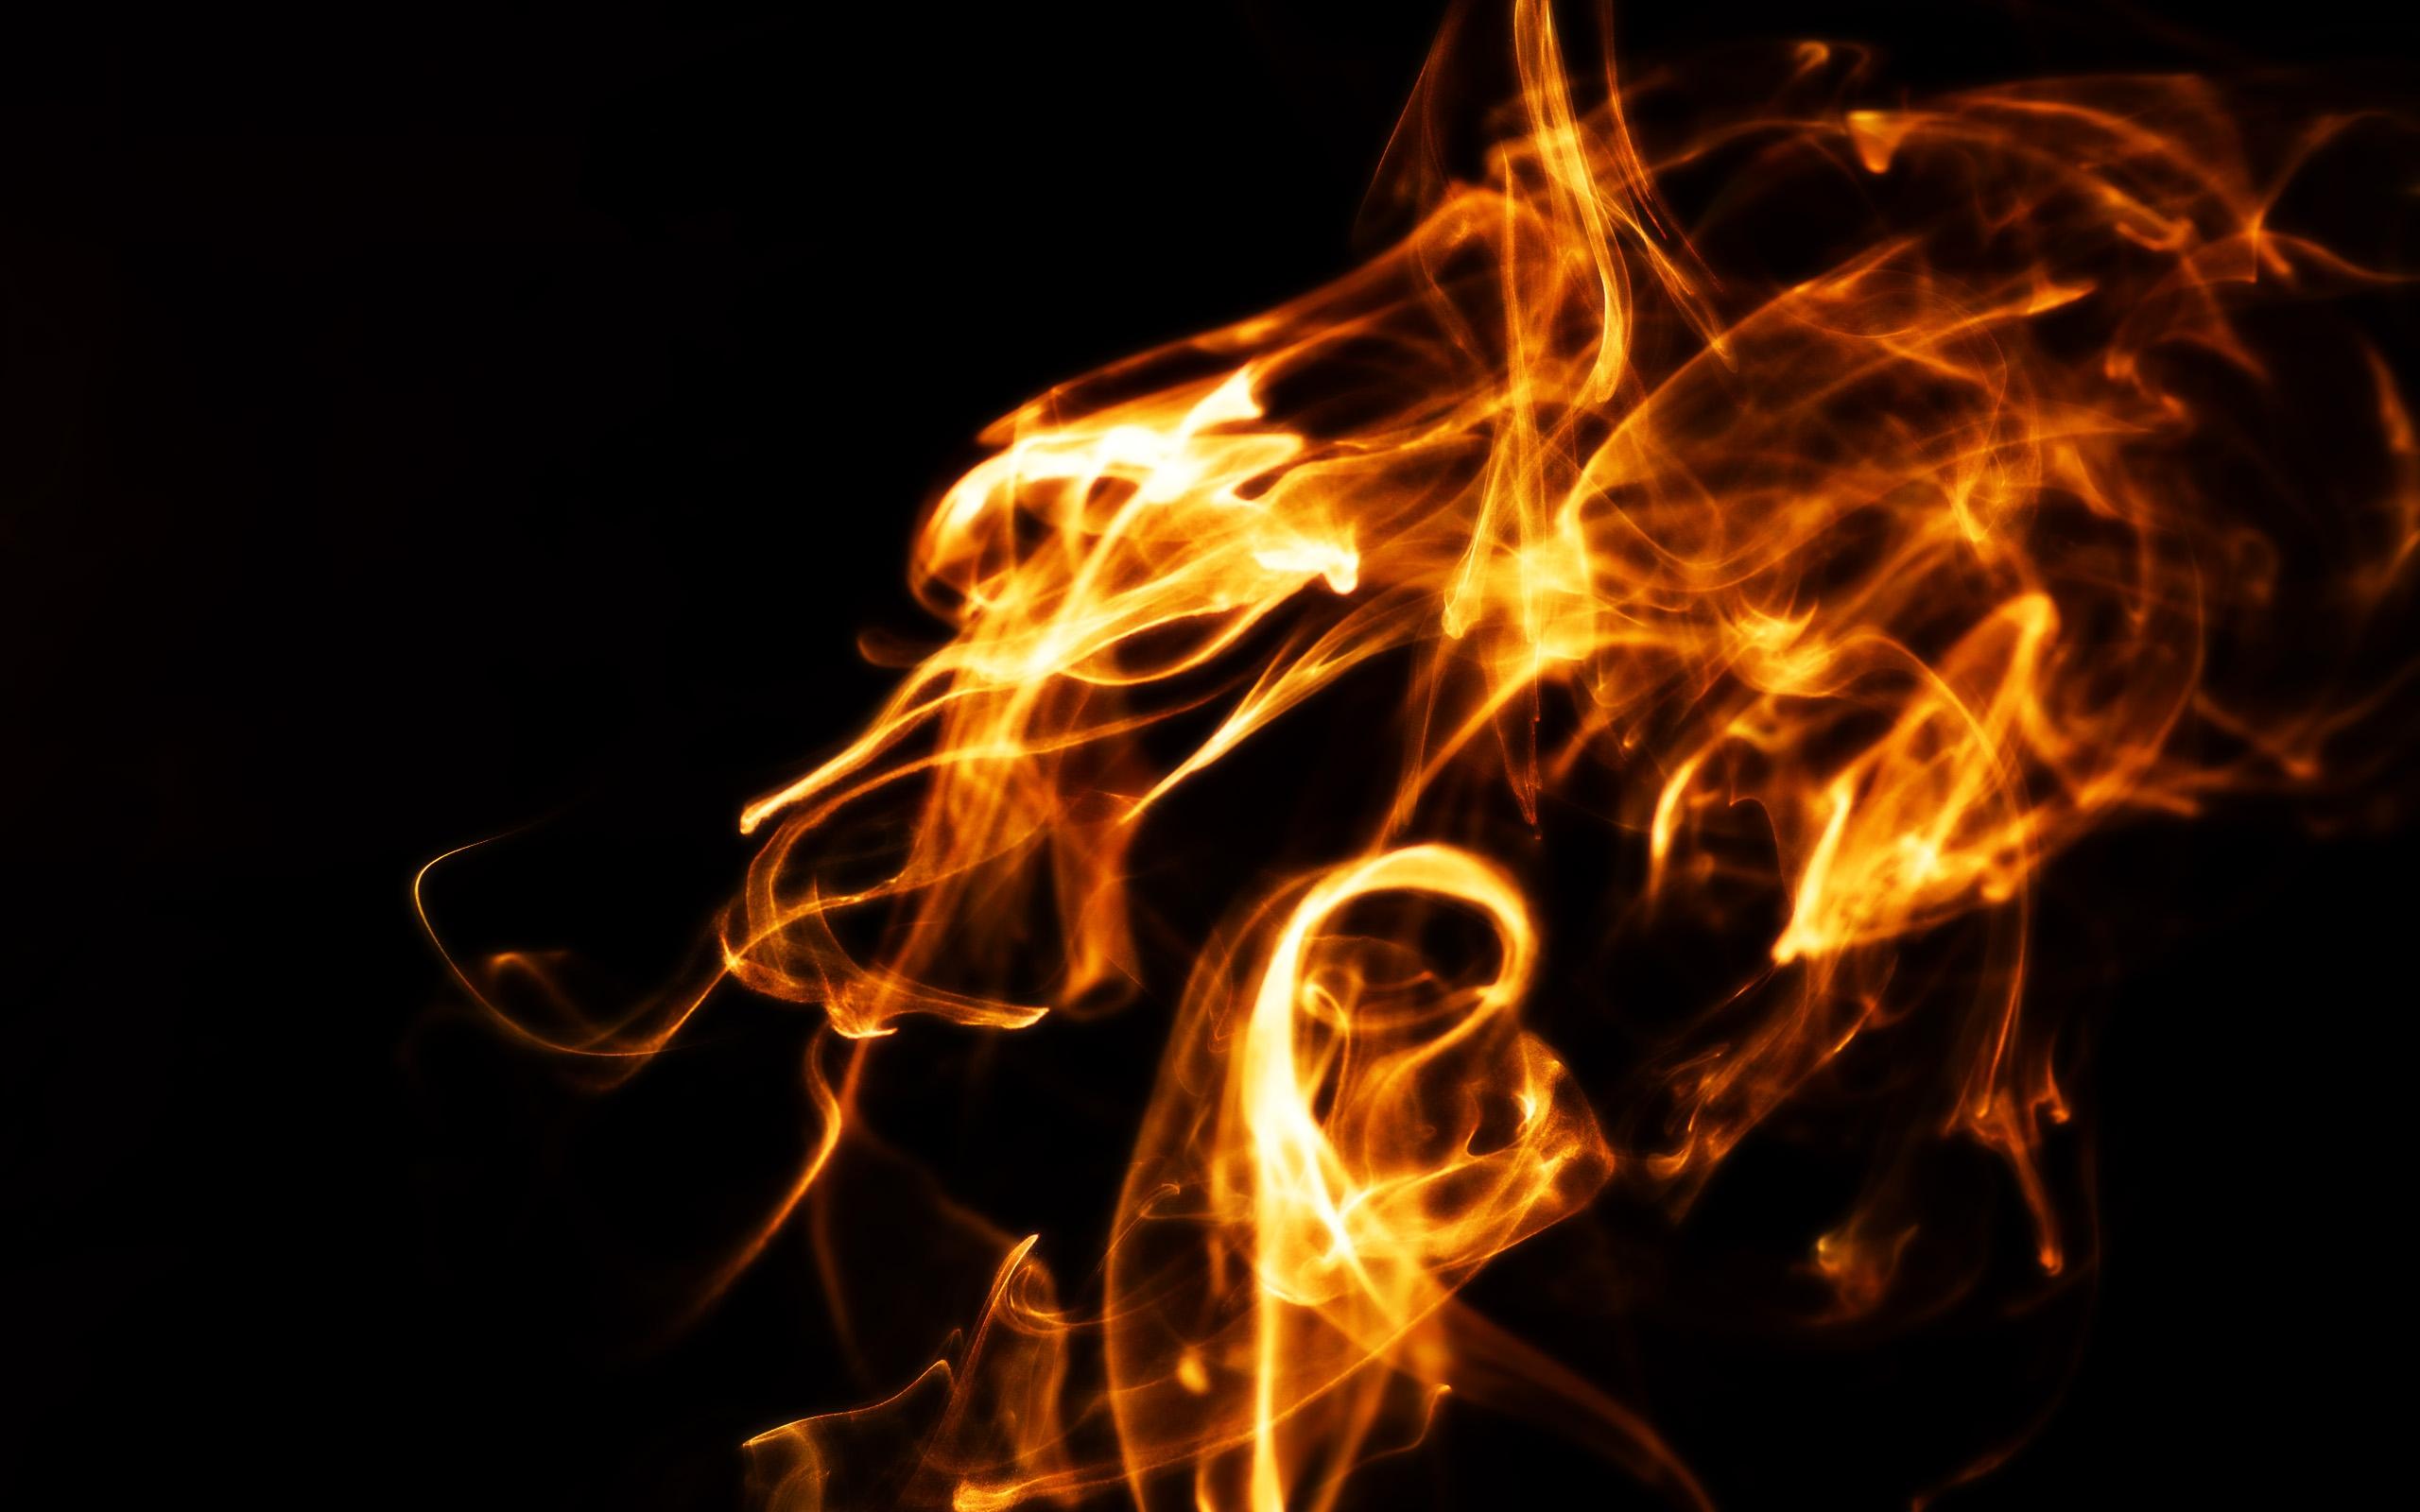 flames 31987